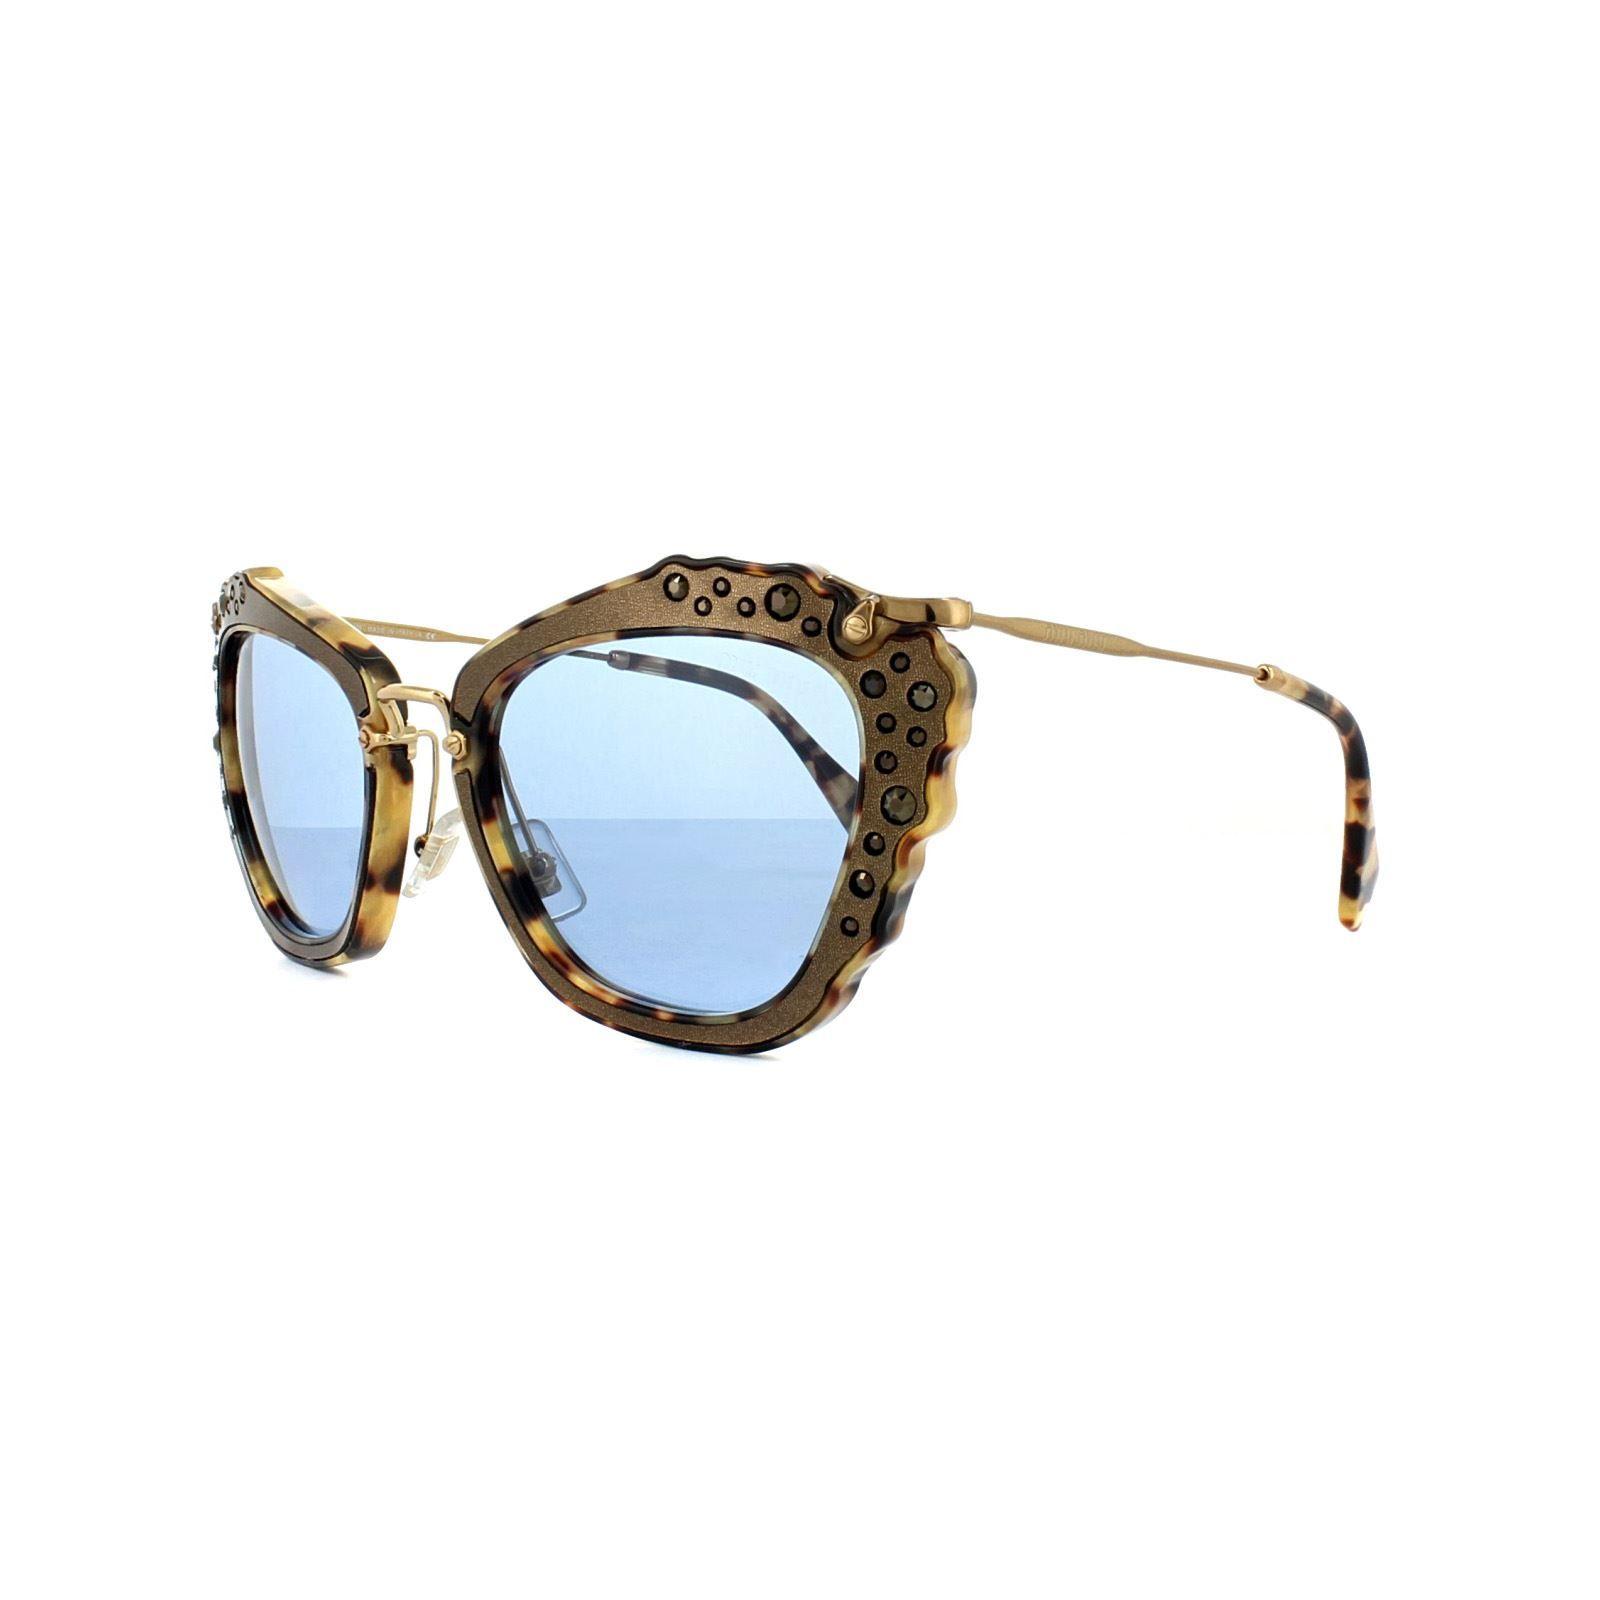 Miu Miu Sunglasses 04QS DHF0A2 Brown Light Havana Gold Blue